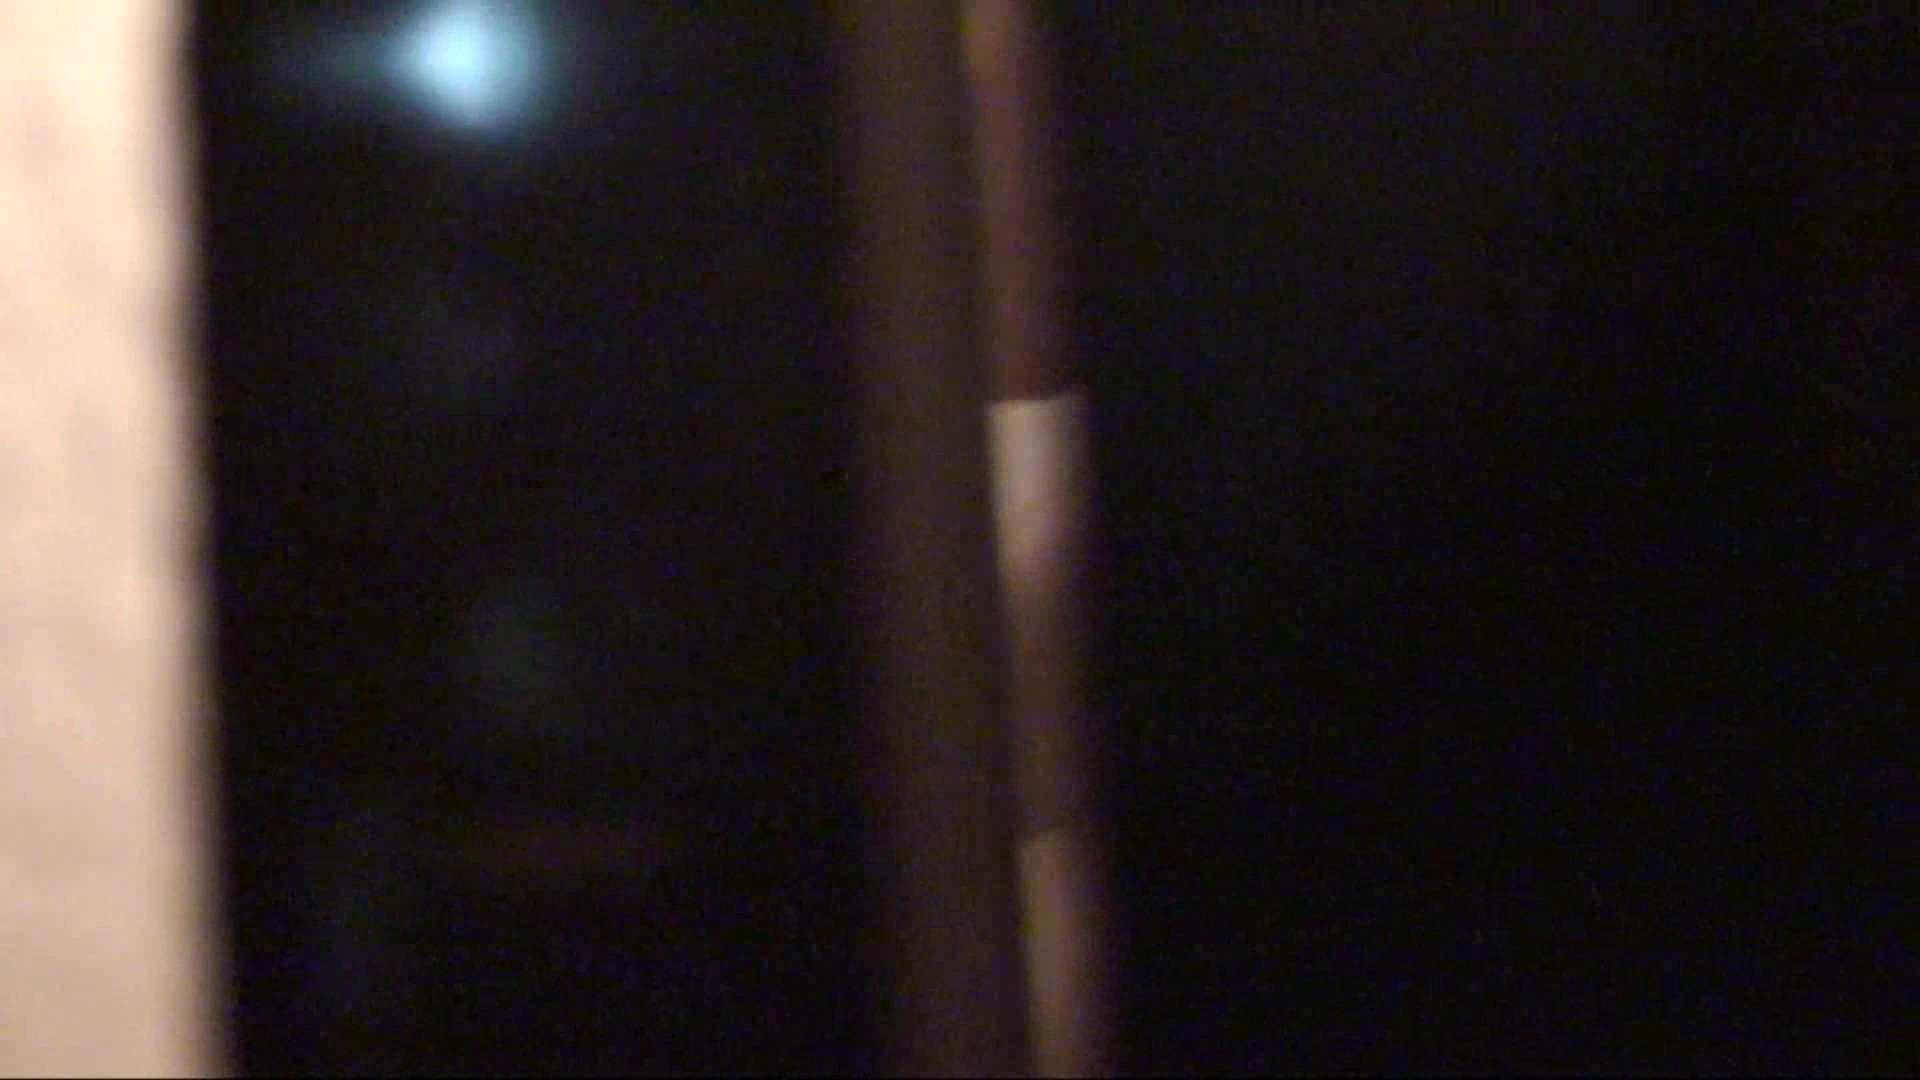 vol.01必見!白肌嬢の乳首が丸見え。極上美人のすっぴん顔をハイビジョンで! 乳首 オメコ動画キャプチャ 89pic 32